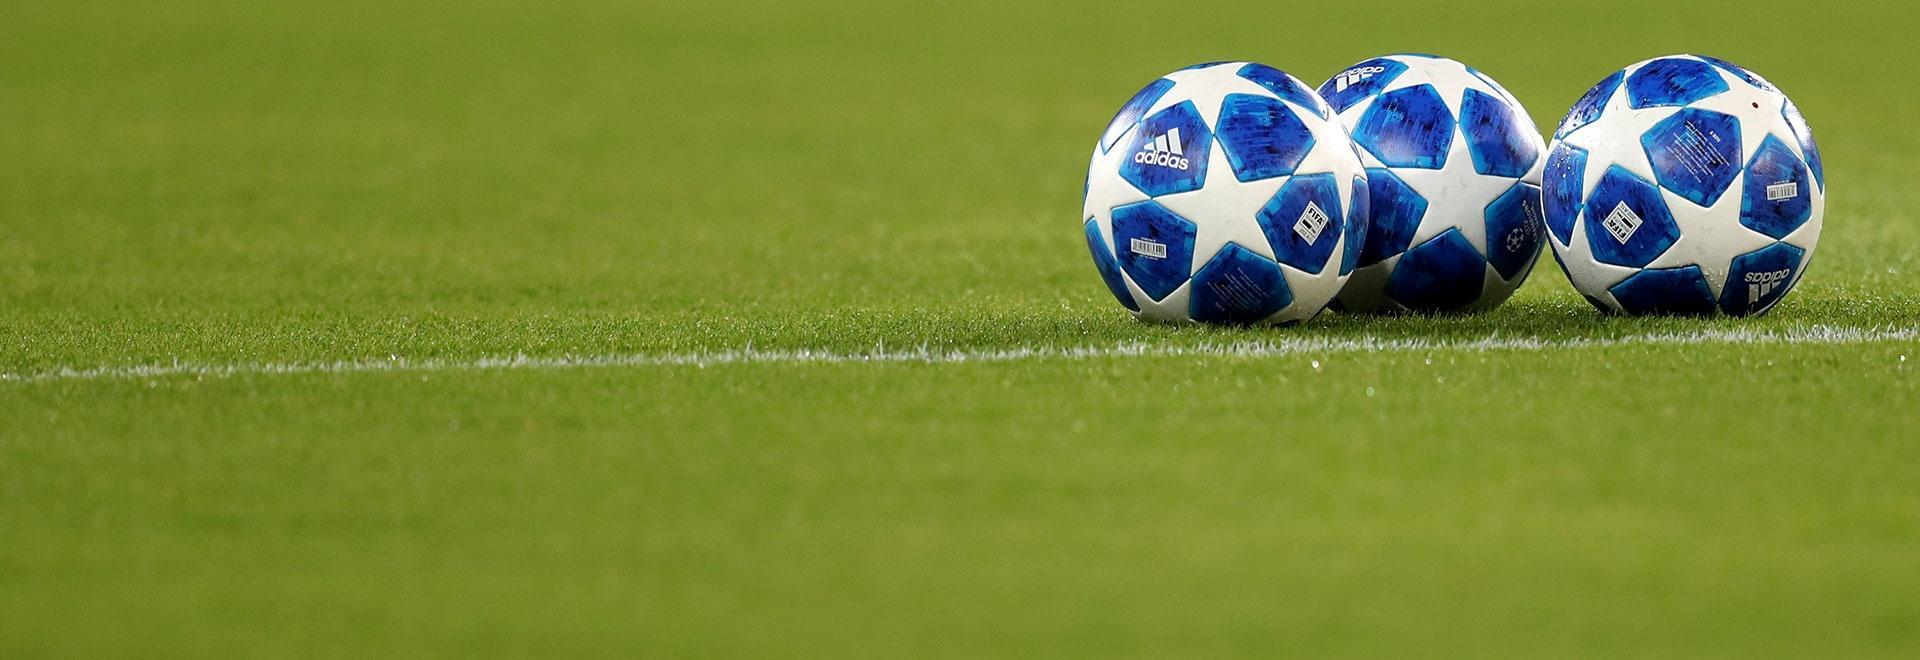 Inter - Chelsea 24/02/10